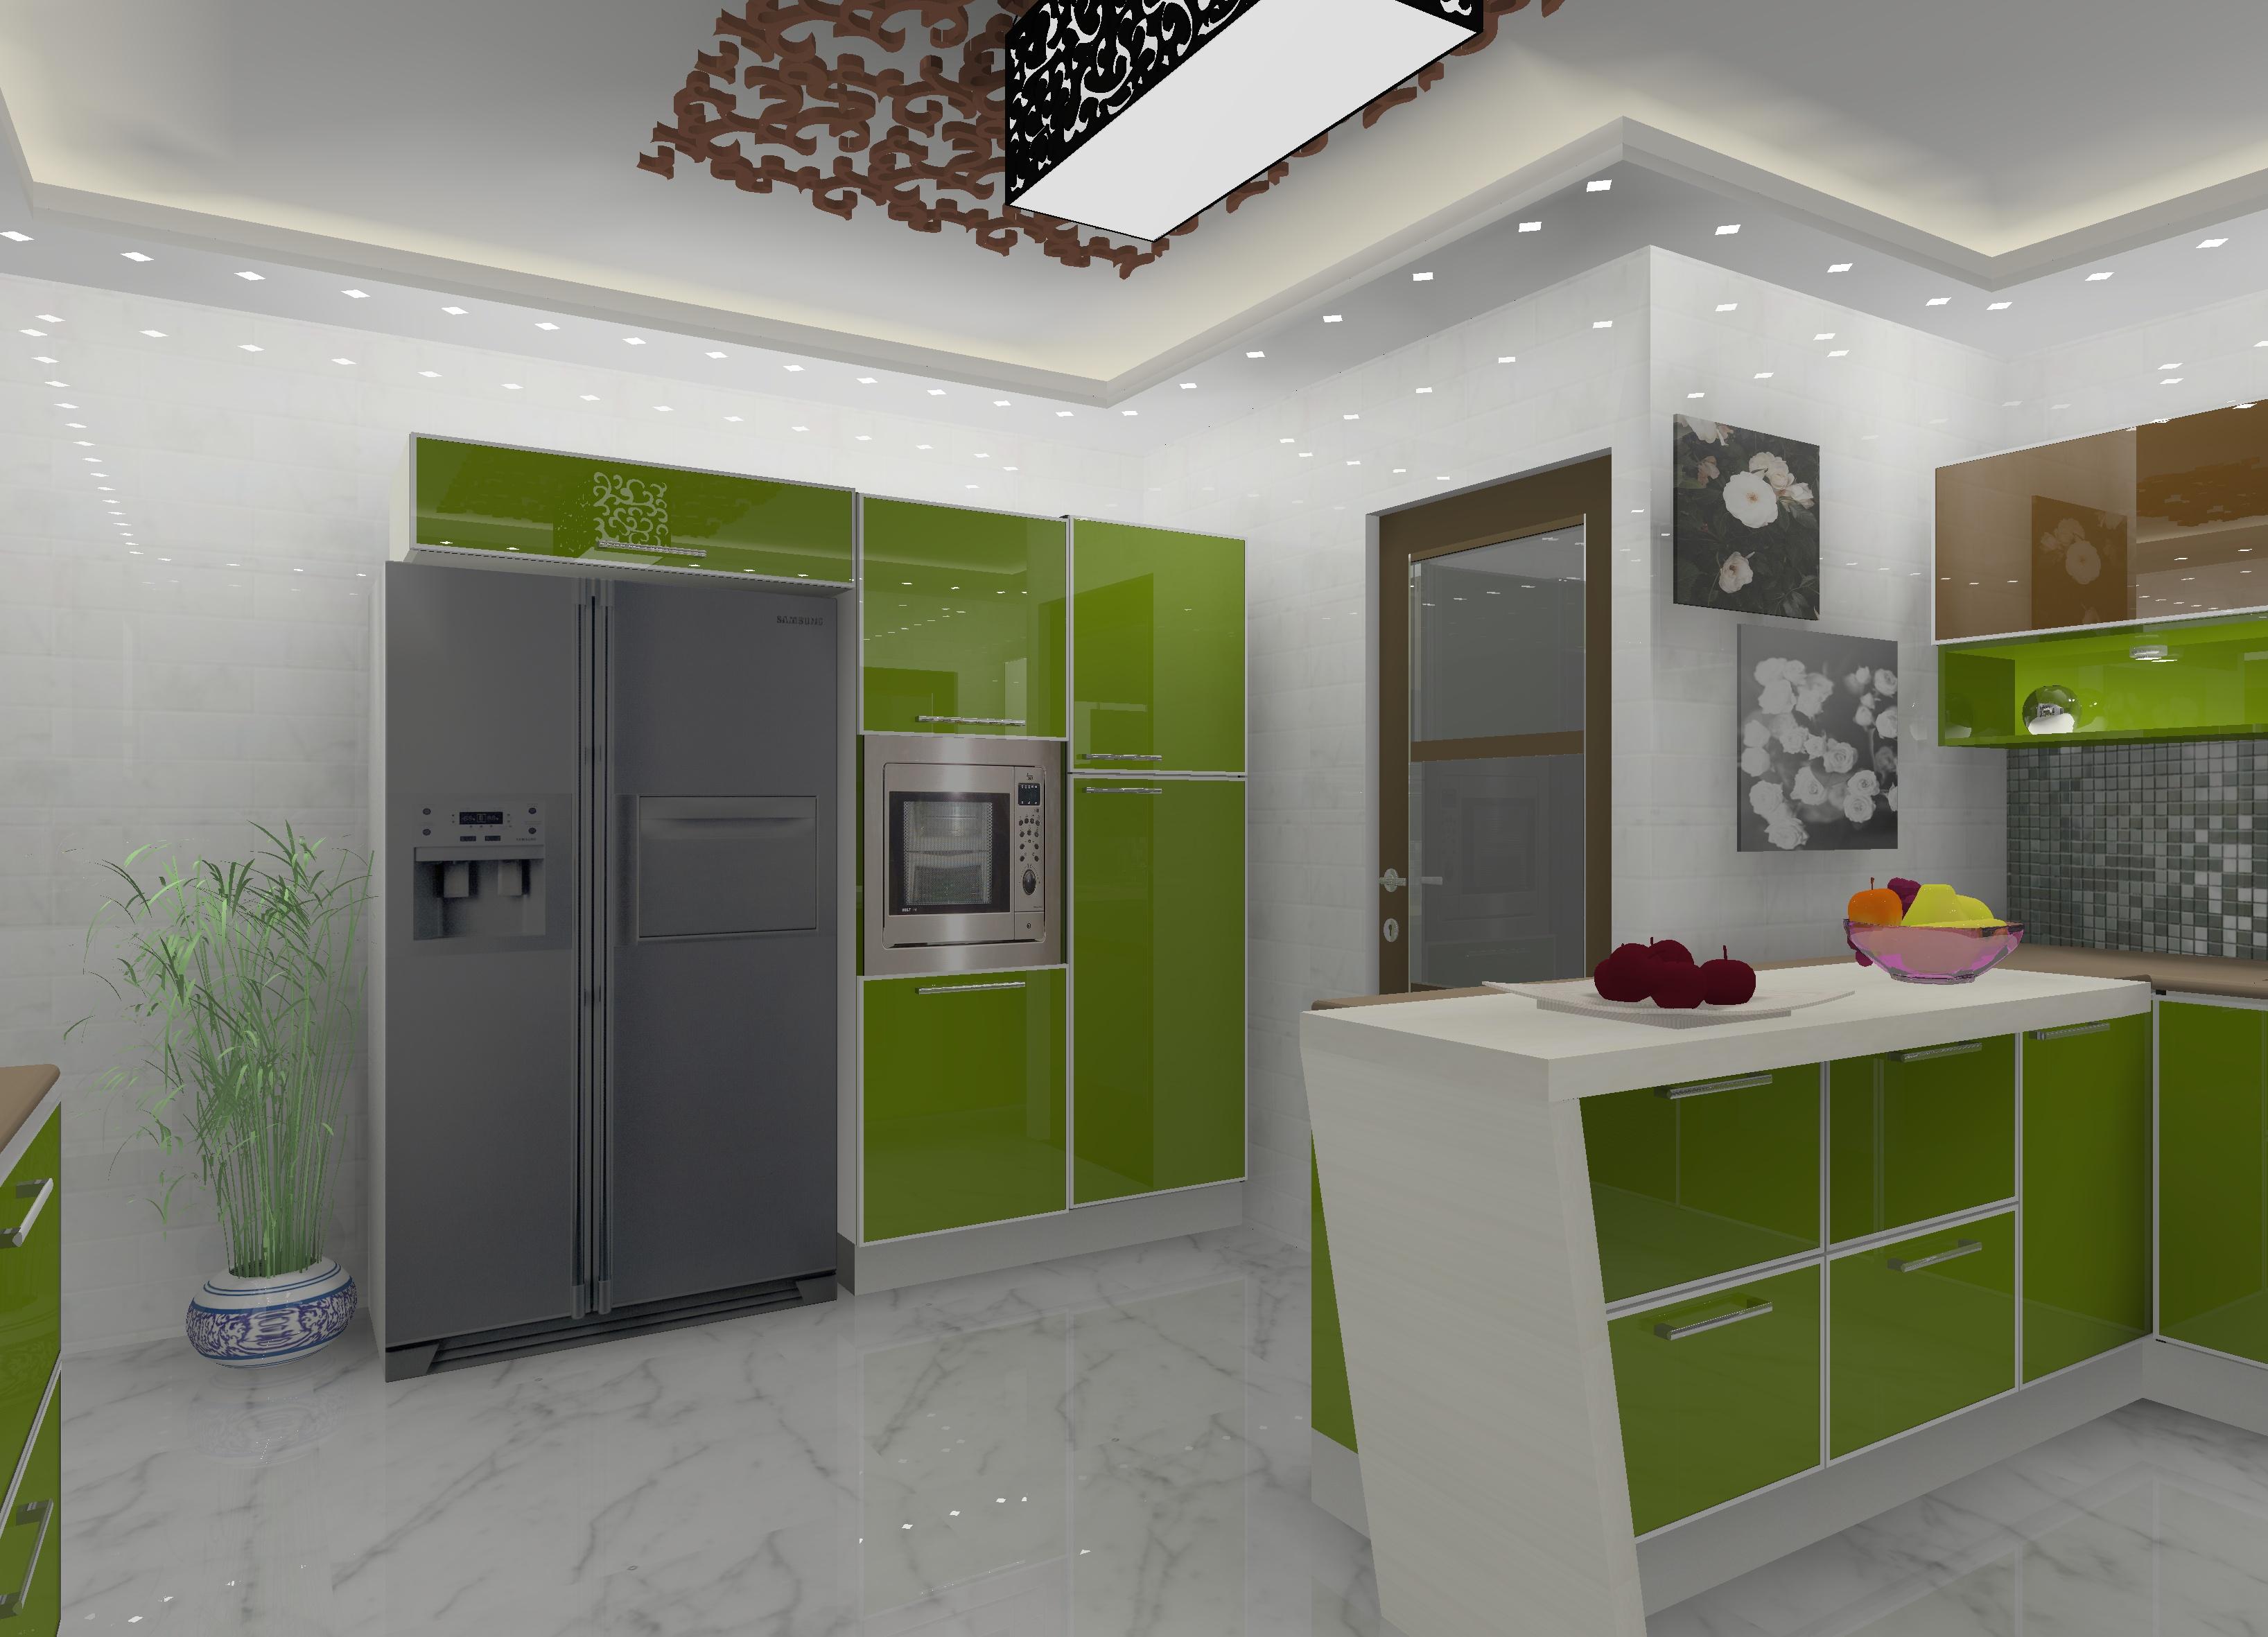 B NCGBN - Kashmir - Zahoor - Ahmed - Ideas - Modular - Kitchens